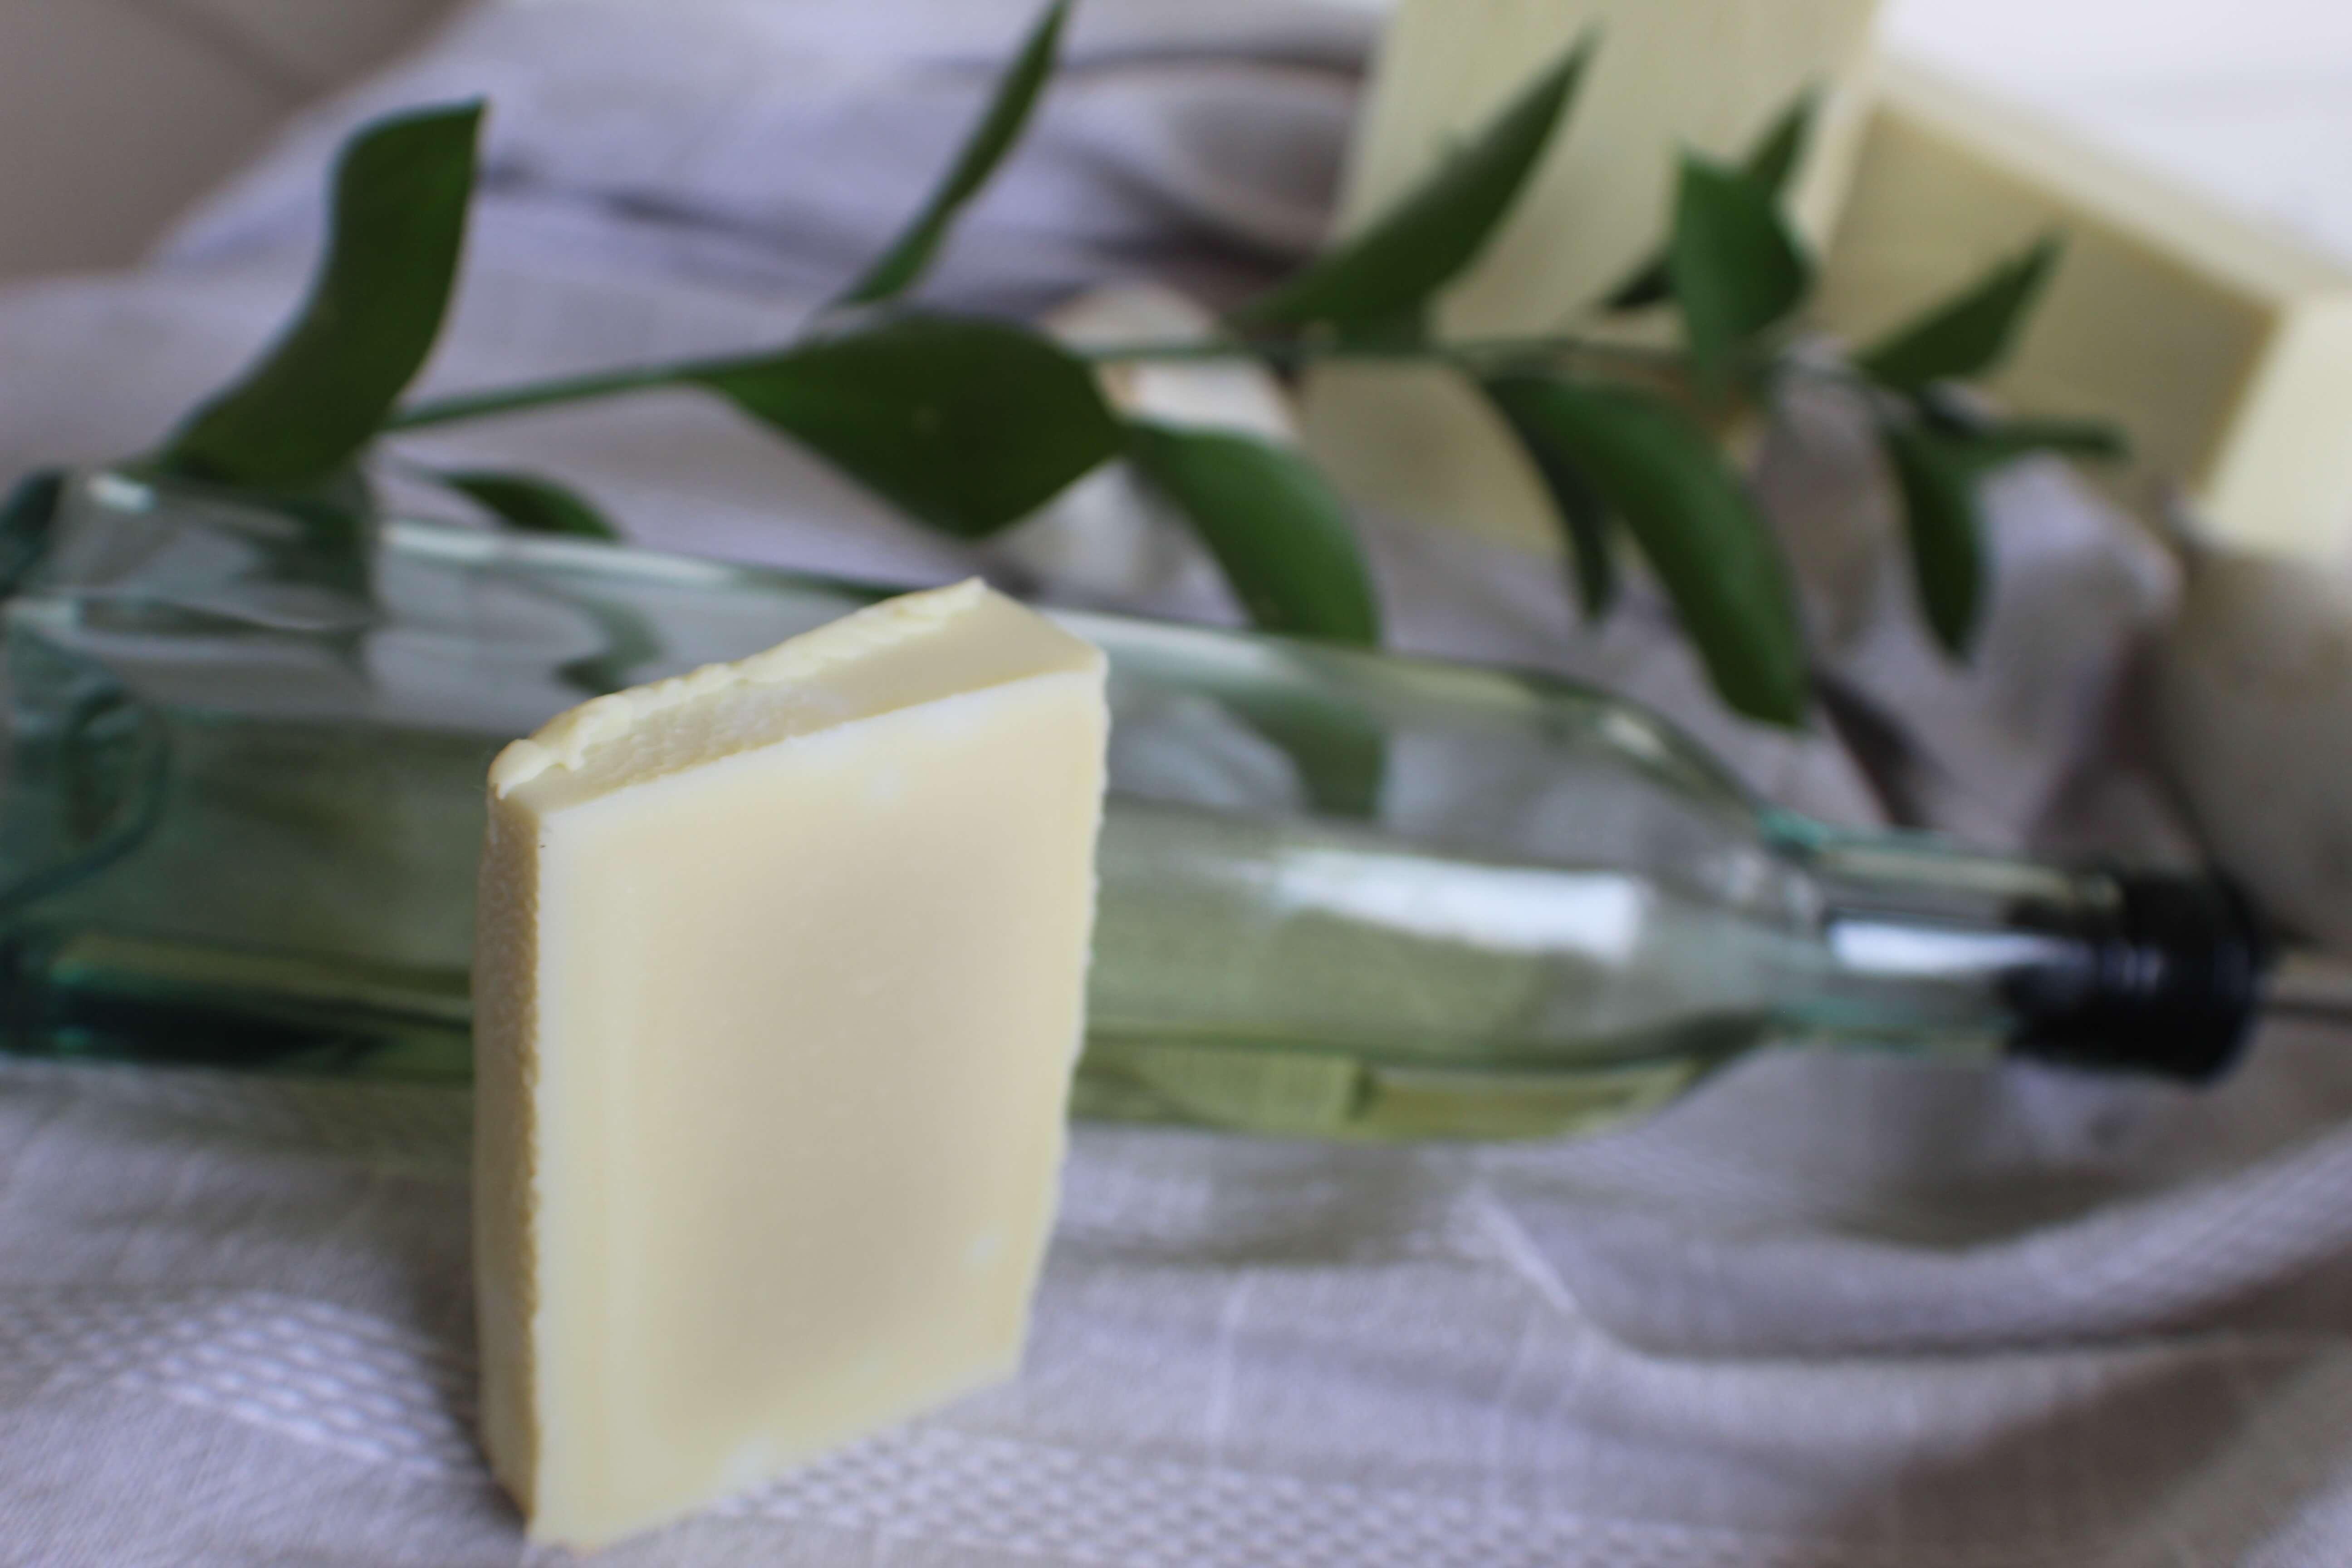 Unscented Organic Castile Soap - Handmade Soap in Georgia